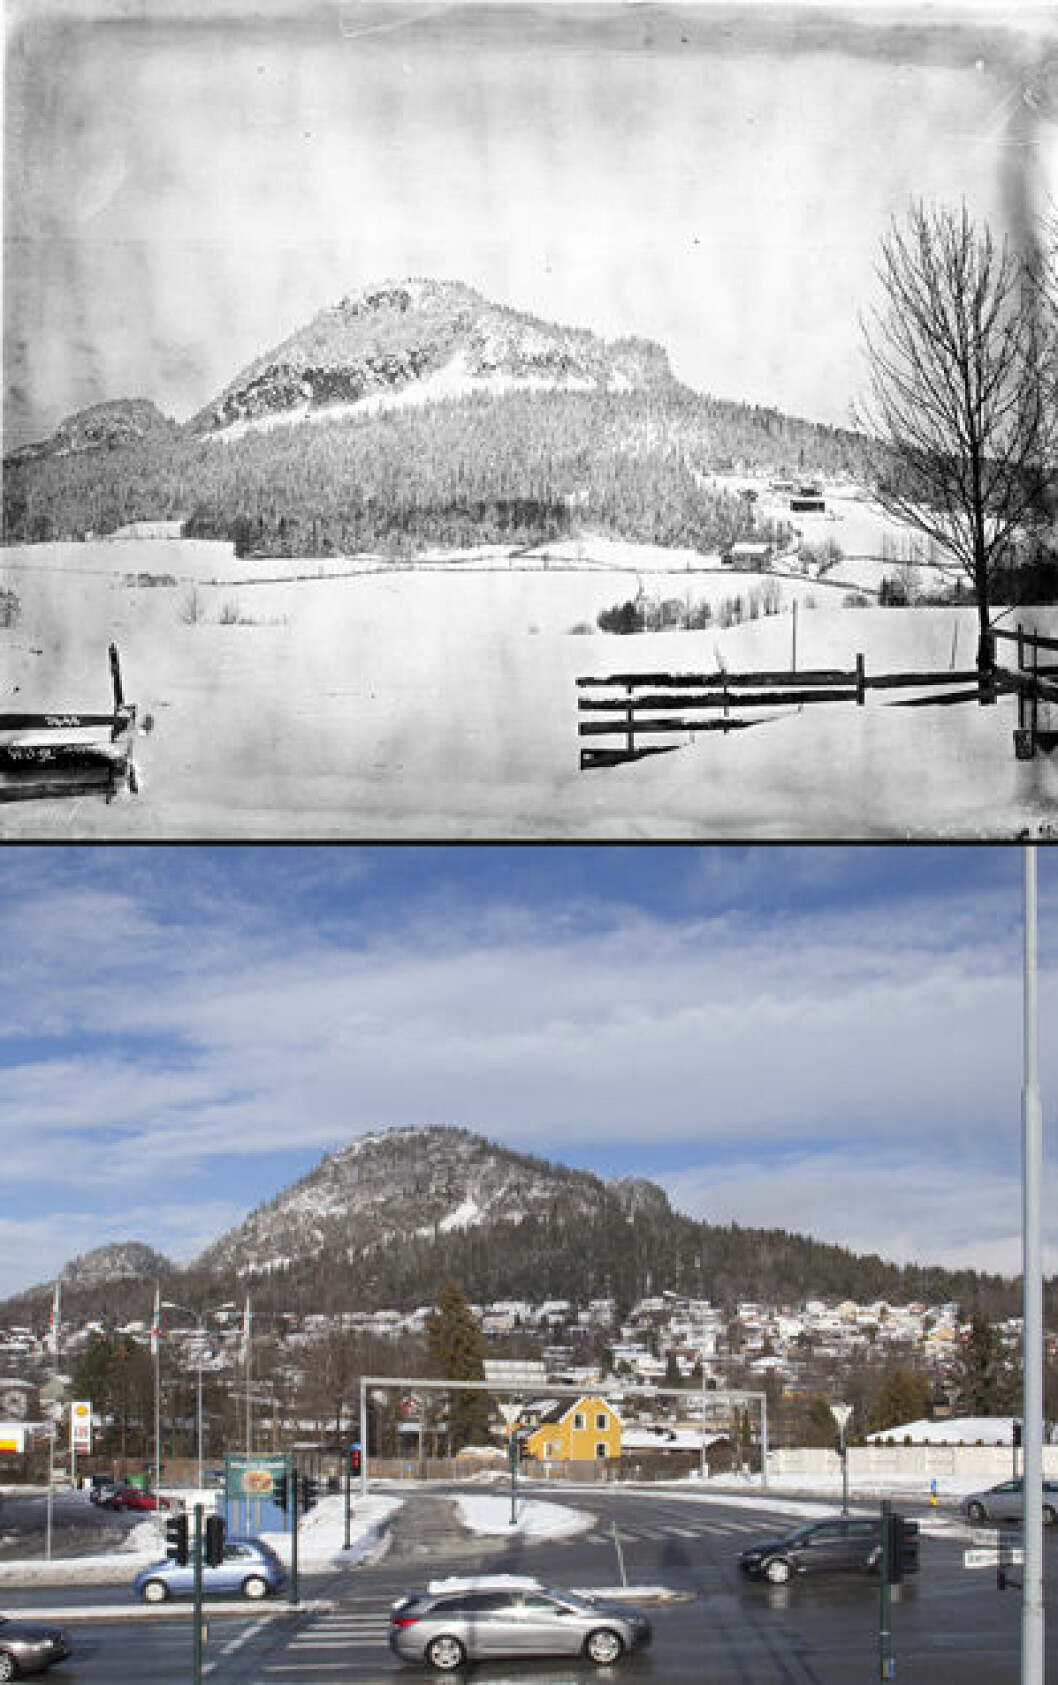 1904 og 2016: Kolsåstoppen i Bærum, Akershus.Foto: Anders Beer Wilse/Oscar Puschmann